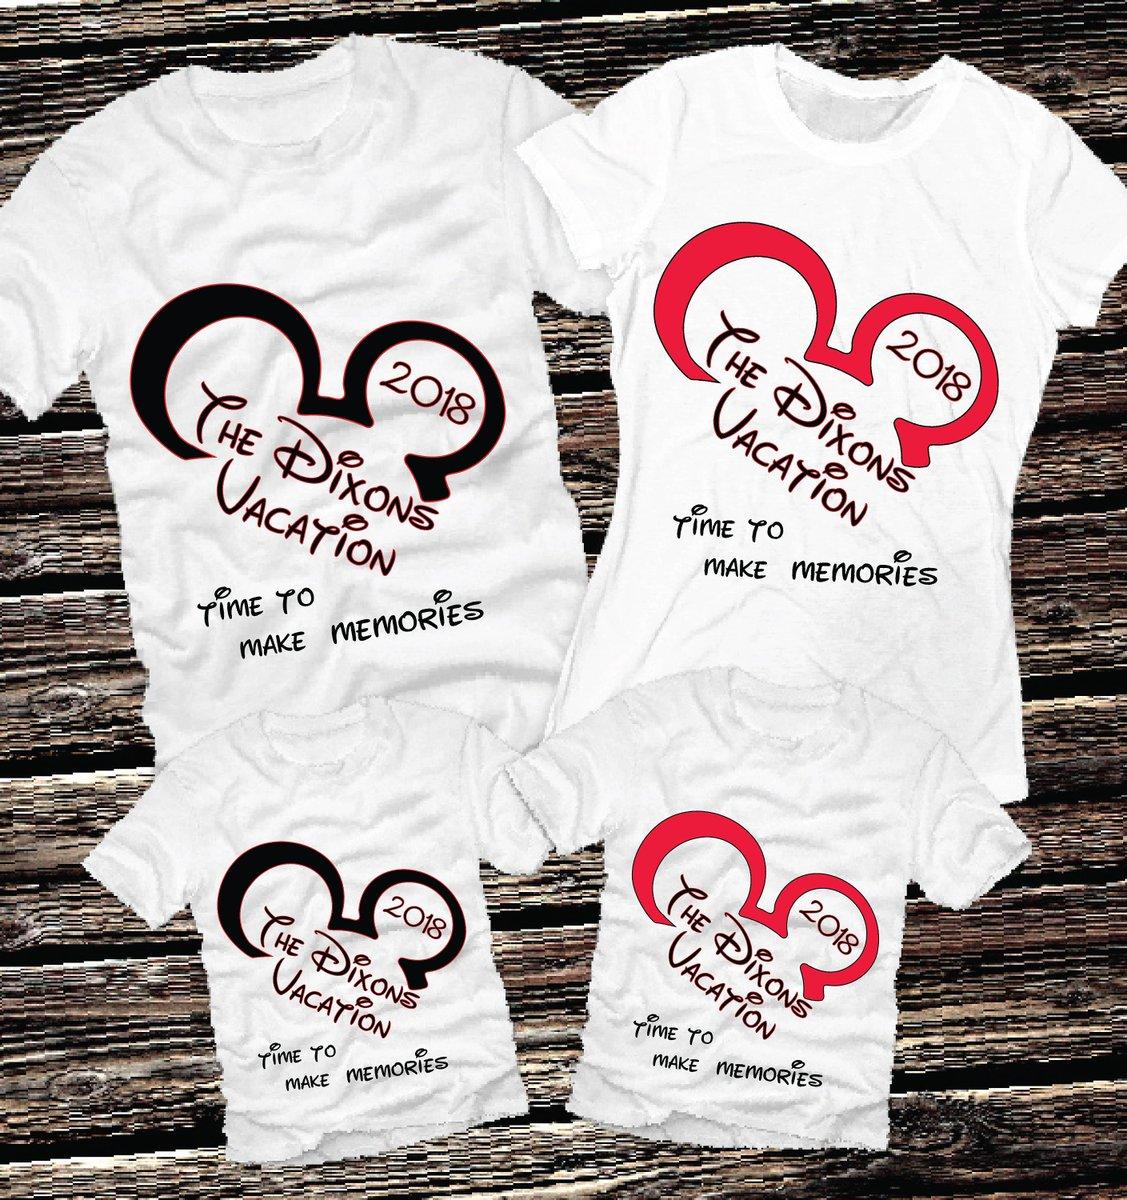 3c7eddc05694a ... shirts Disney Shirts 2018 Disney Trip shirt Custom Disney Ears Family  Matching Disney Shirts Disney World Disneyland trip https://etsy.me/2KgtFC1  ...